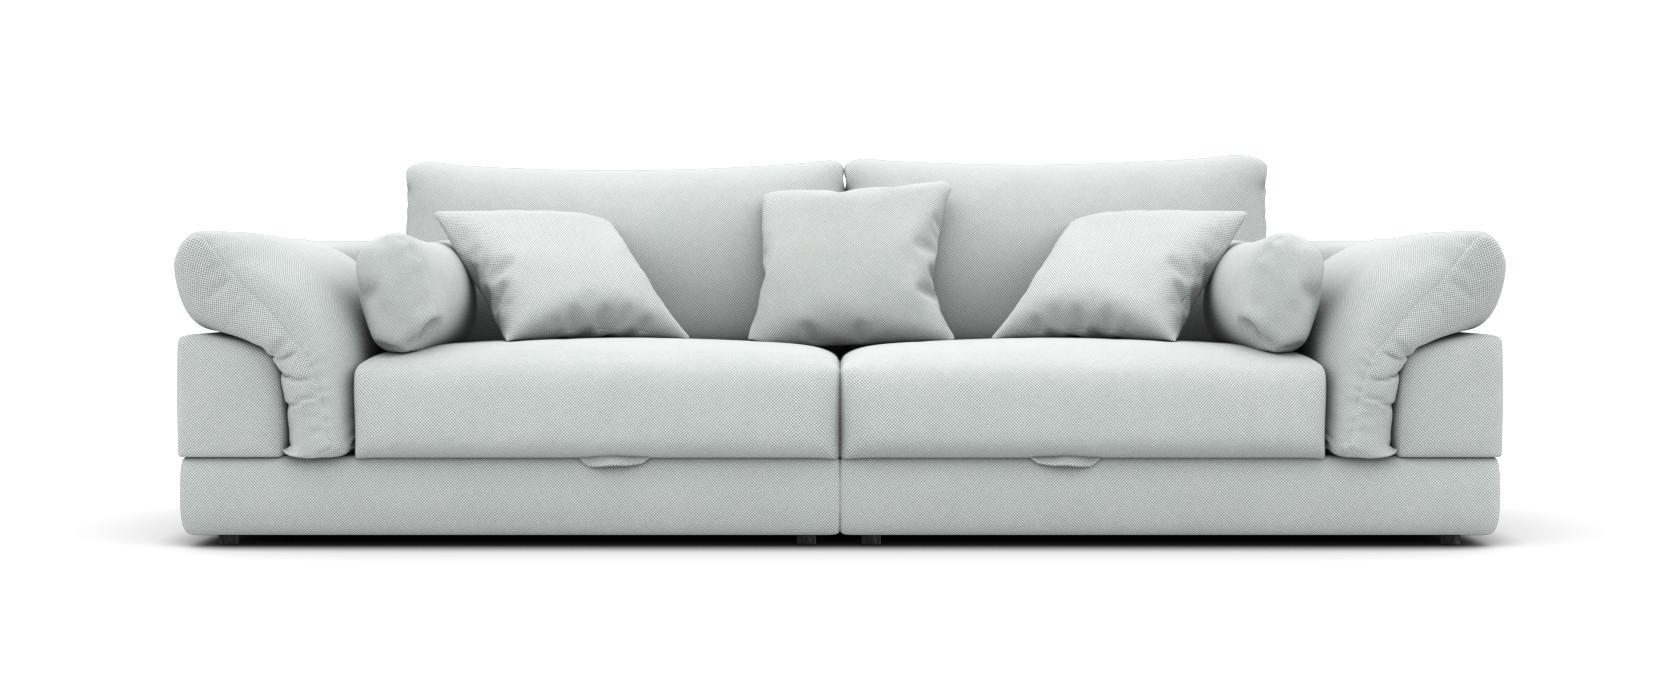 Тримісний диван Claudia - Фото 1 - Pufetto